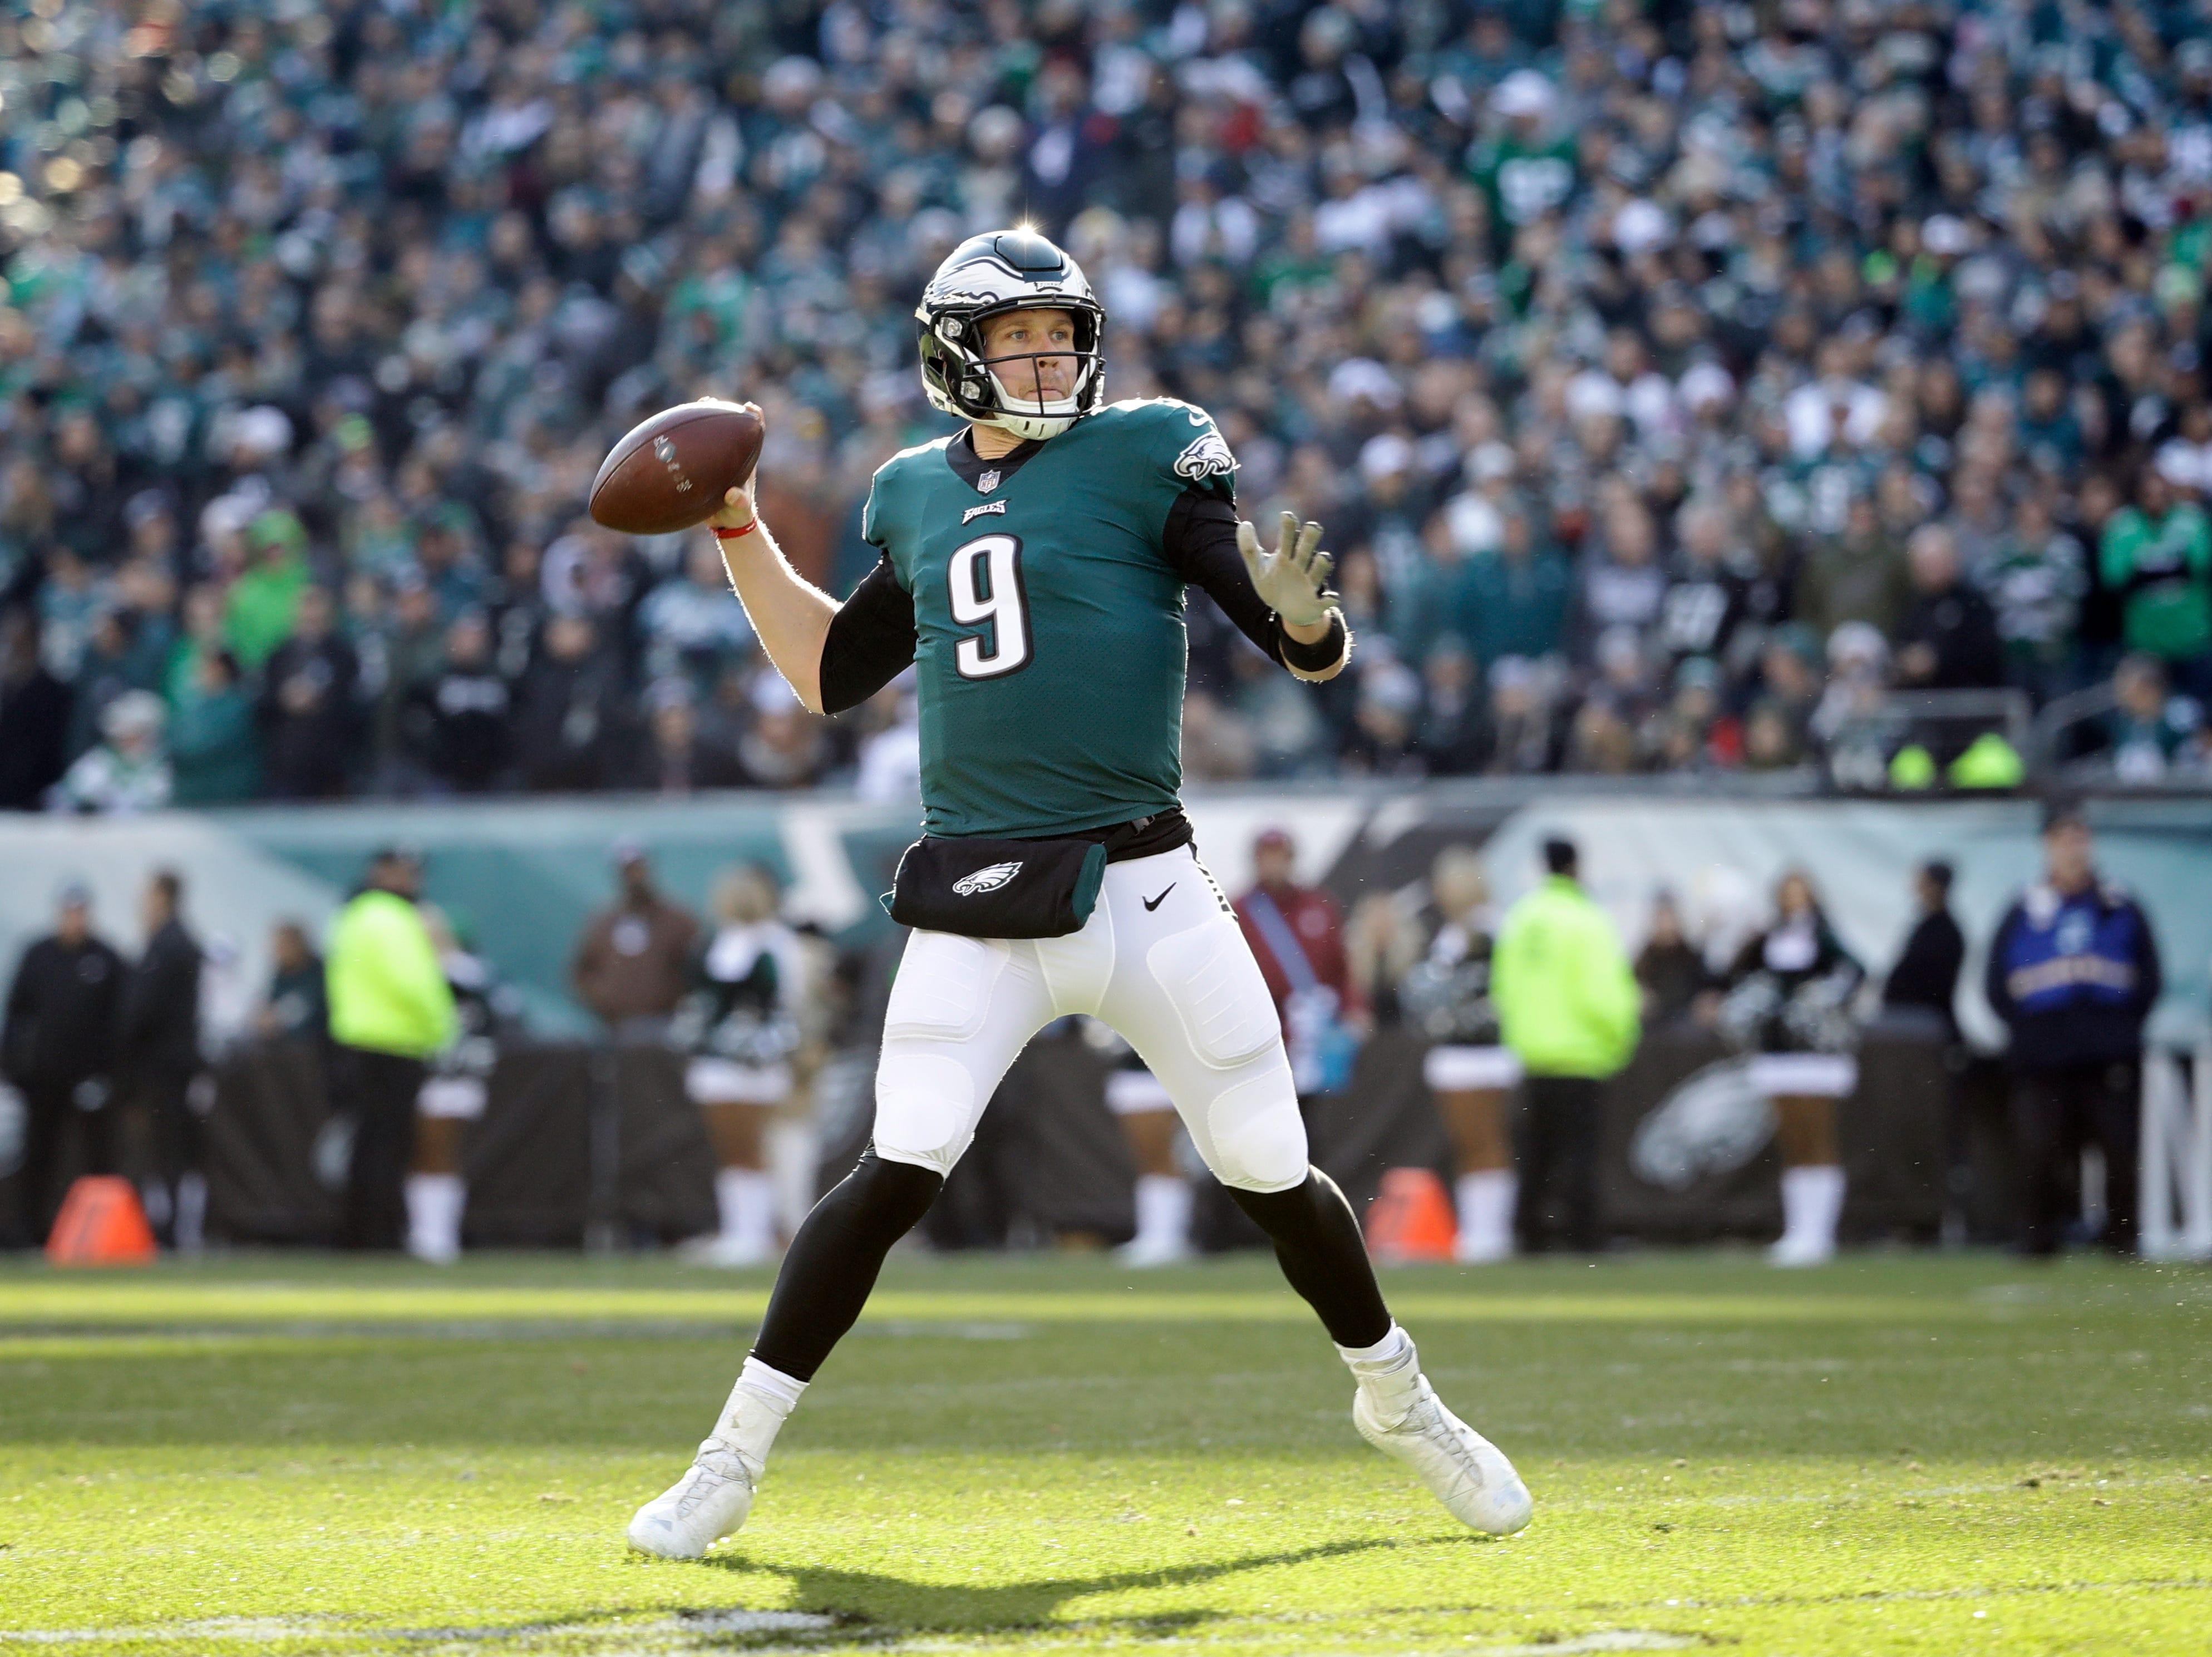 Philadelphia Eagles' Nick Foles in action during the first half of an NFL football game against the Houston Texans, Sunday, Dec. 23, 2018, in Philadelphia. (AP Photo/Matt Rourke)